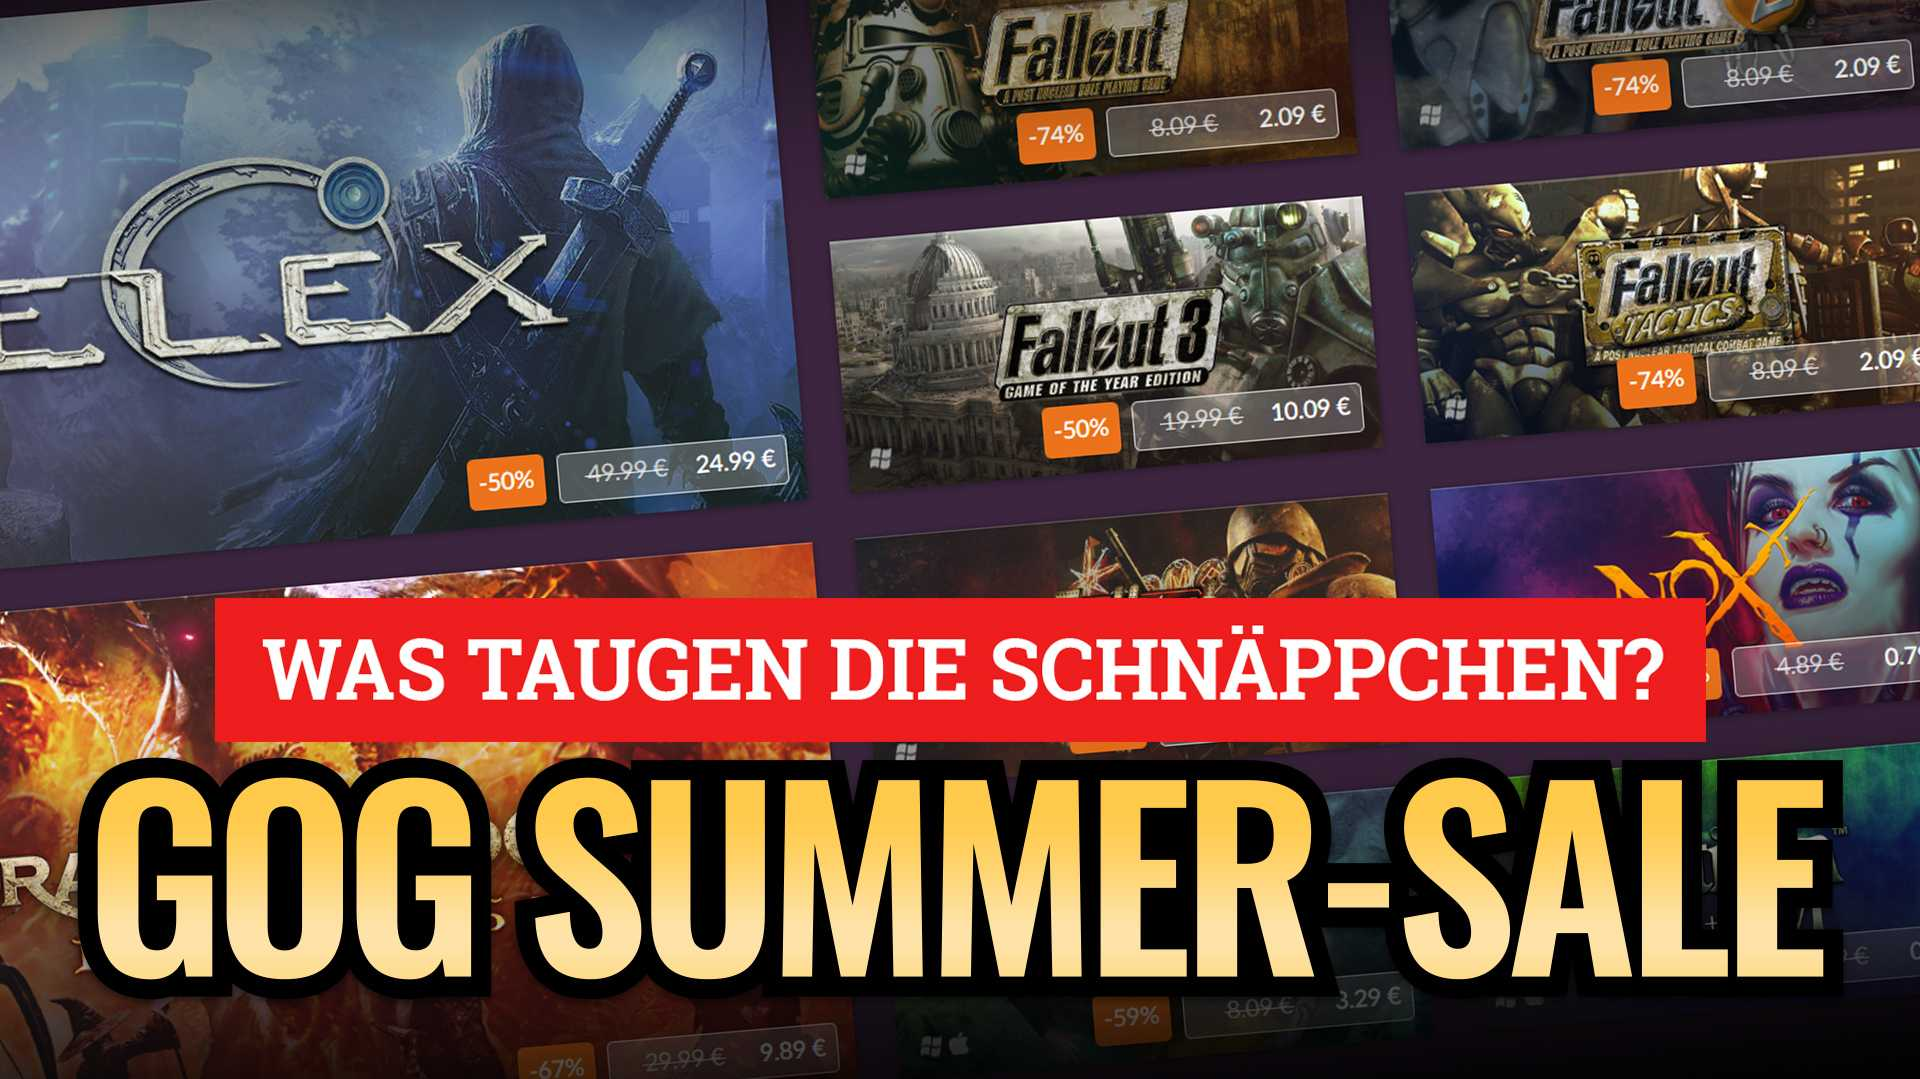 Deal-Check: GOG Summer-Sale